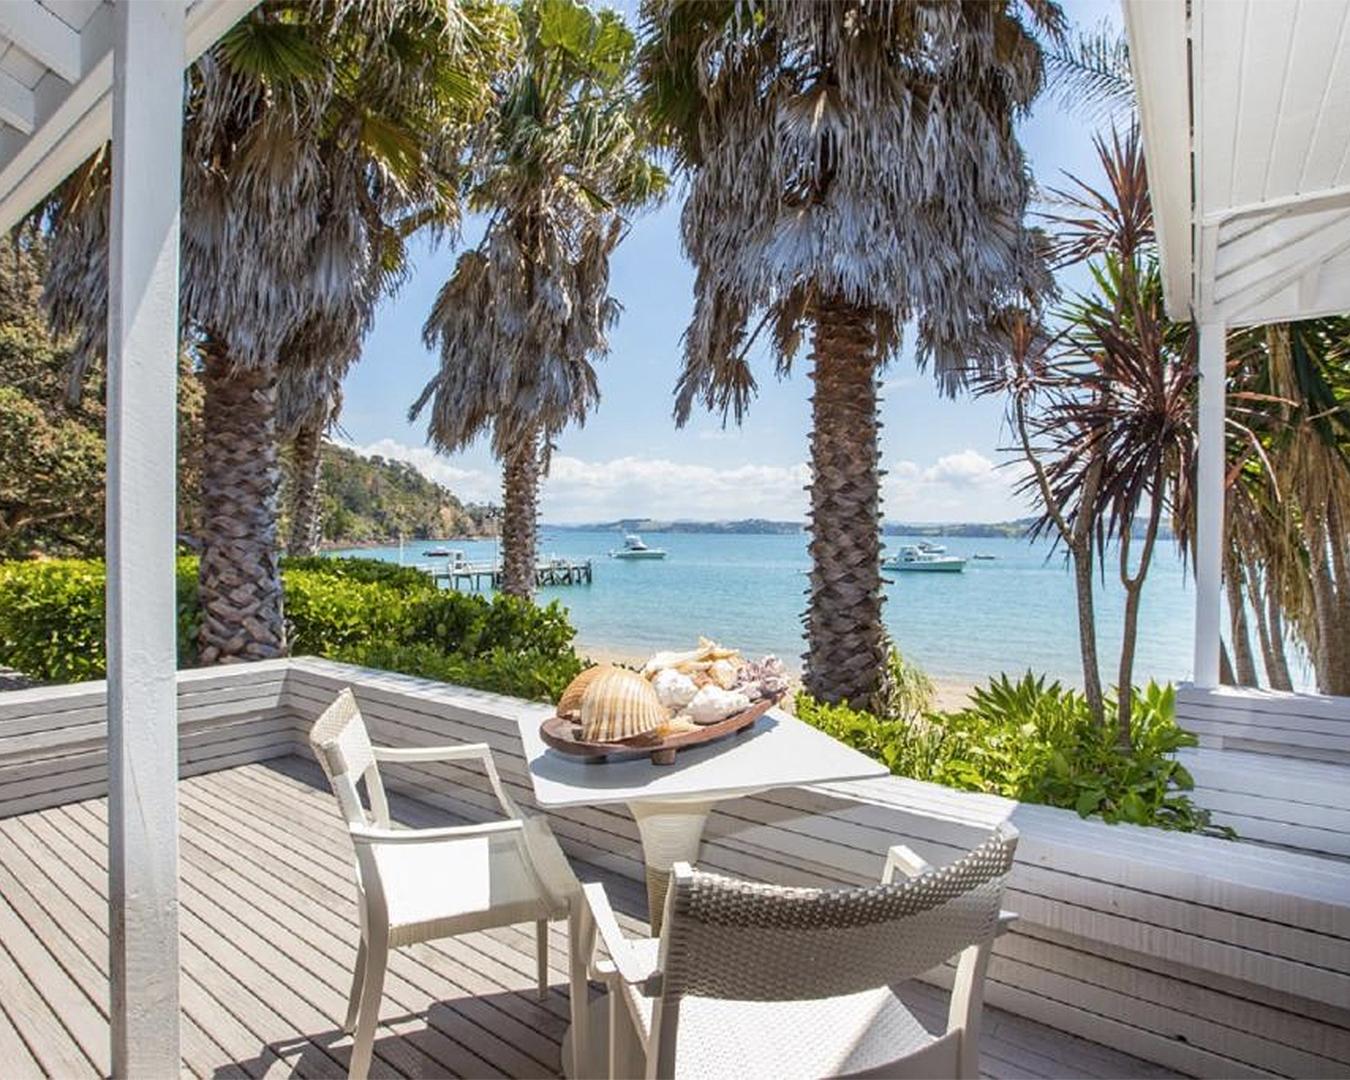 Two chairs overlook stunning sea at The Beach House on Kawau Island.